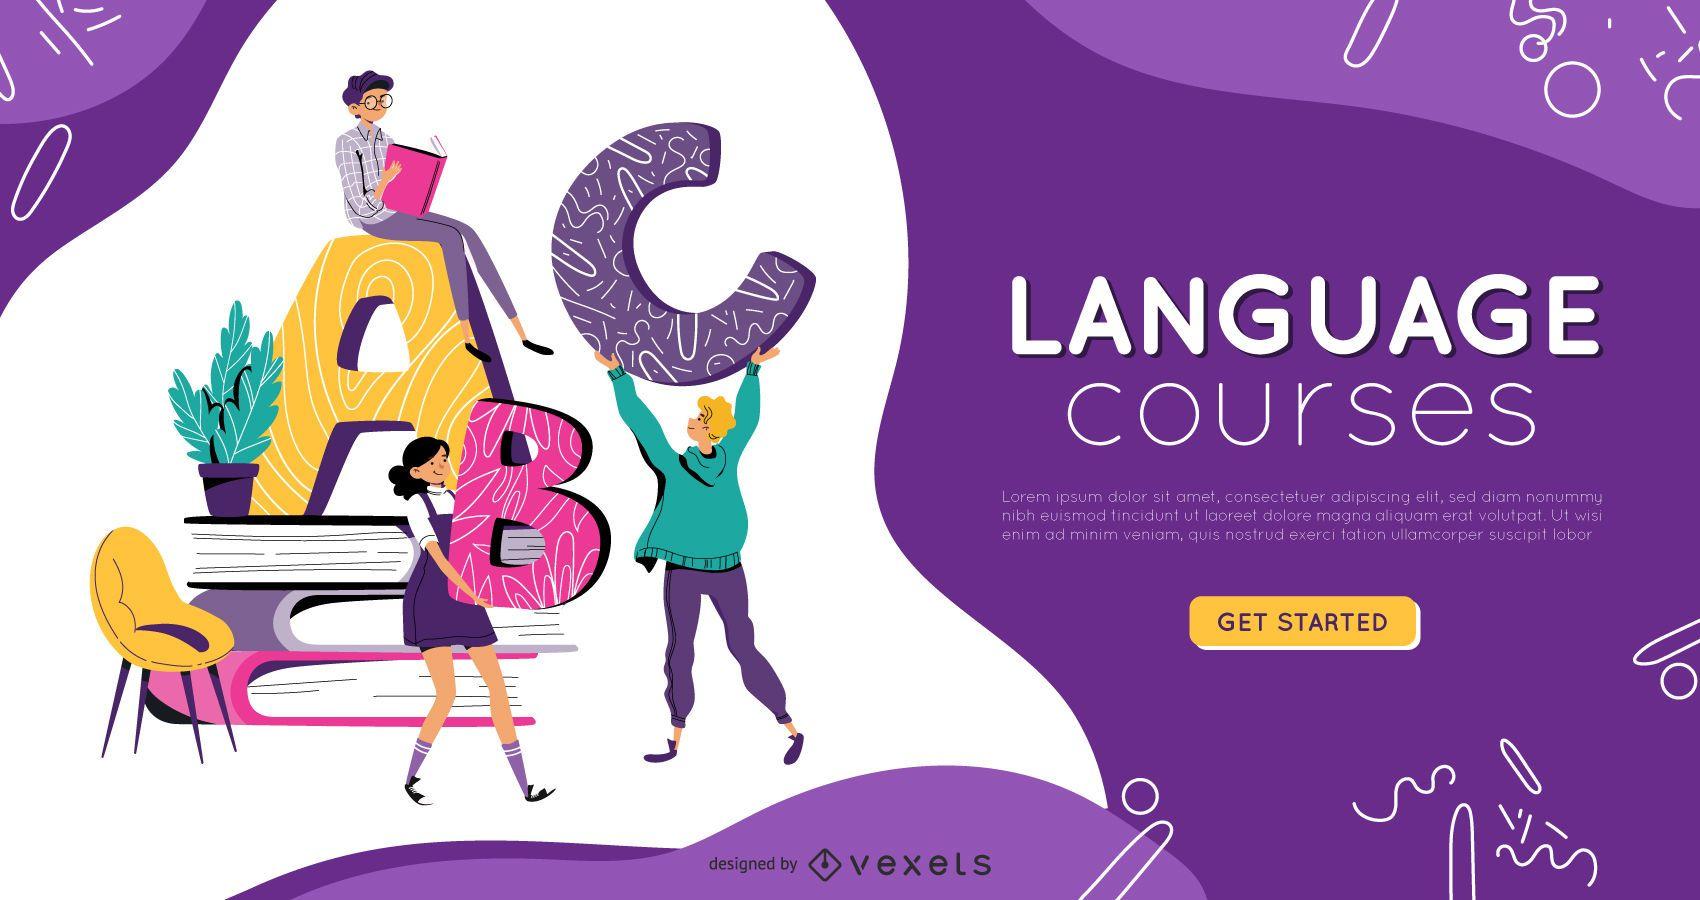 Diseño de portada de educación para cursos de idiomas